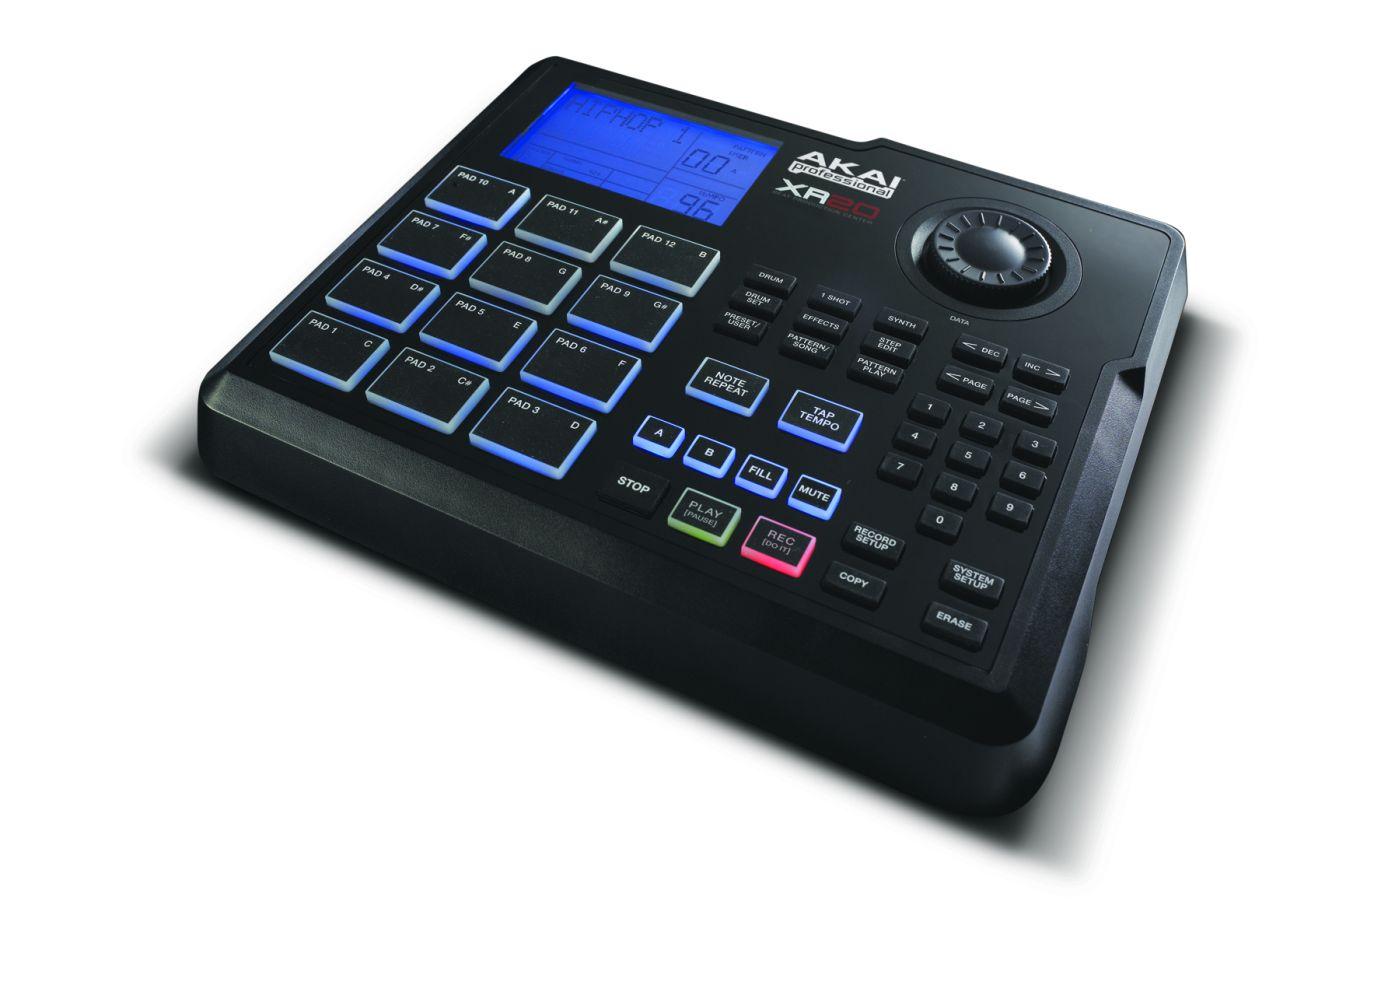 Maszyna perkusyjna AKAI XR20 i Kontroler MIDI AKAI MPD32